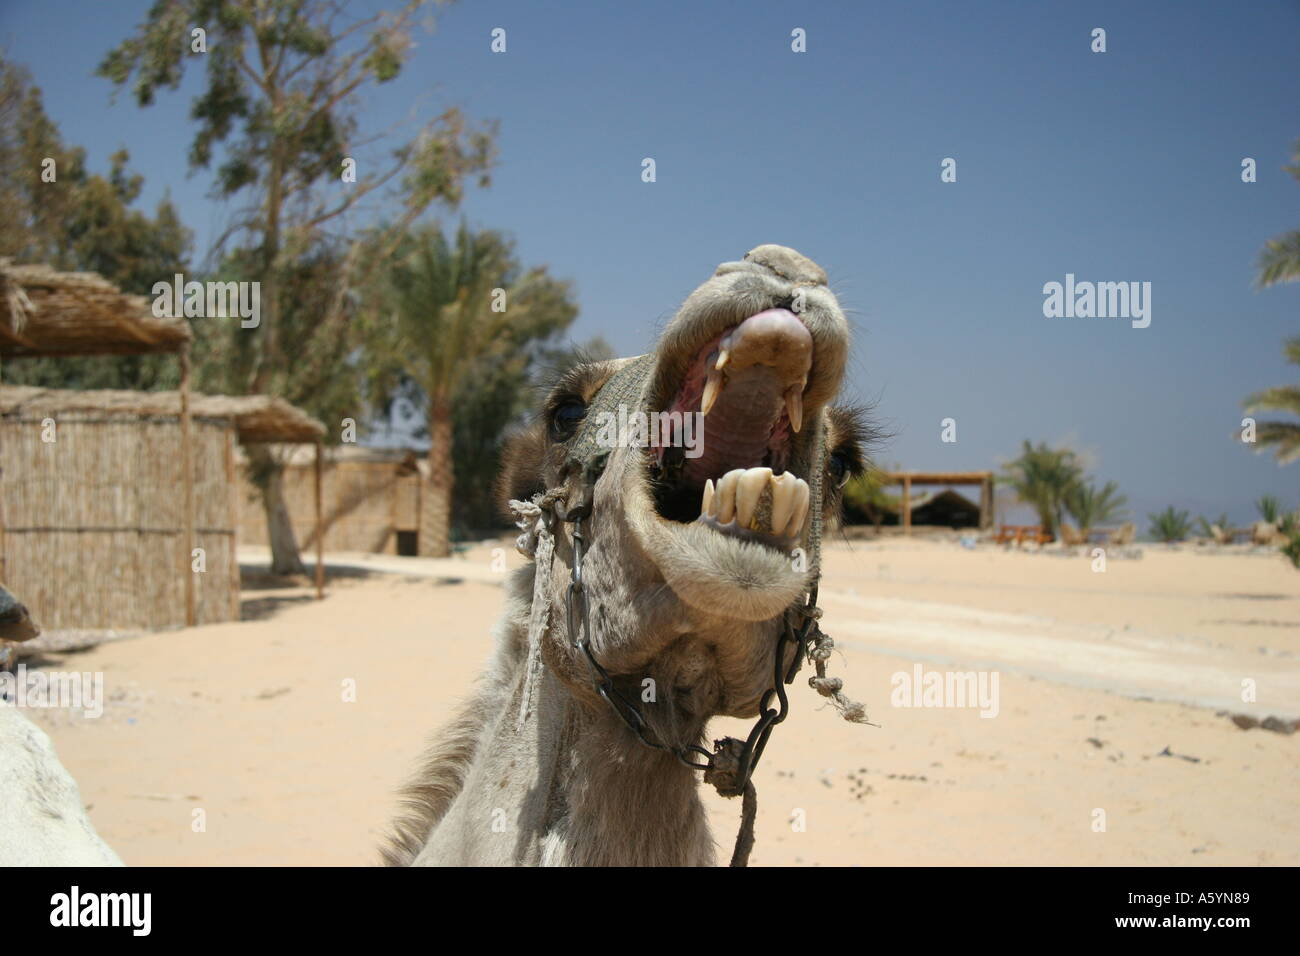 camel - Stock Image